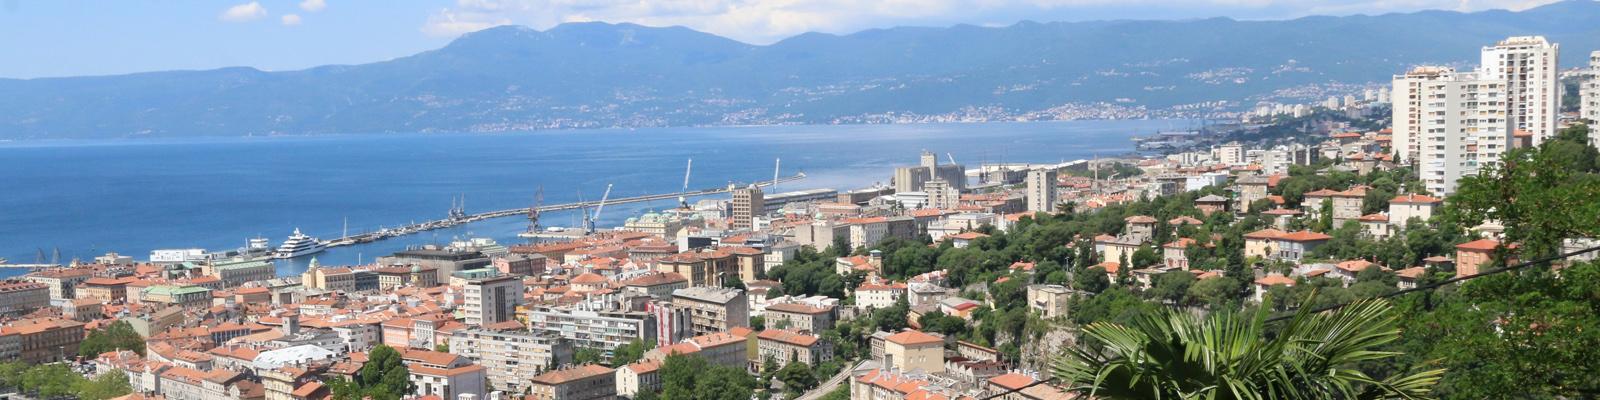 City of Rijeka Development Plan